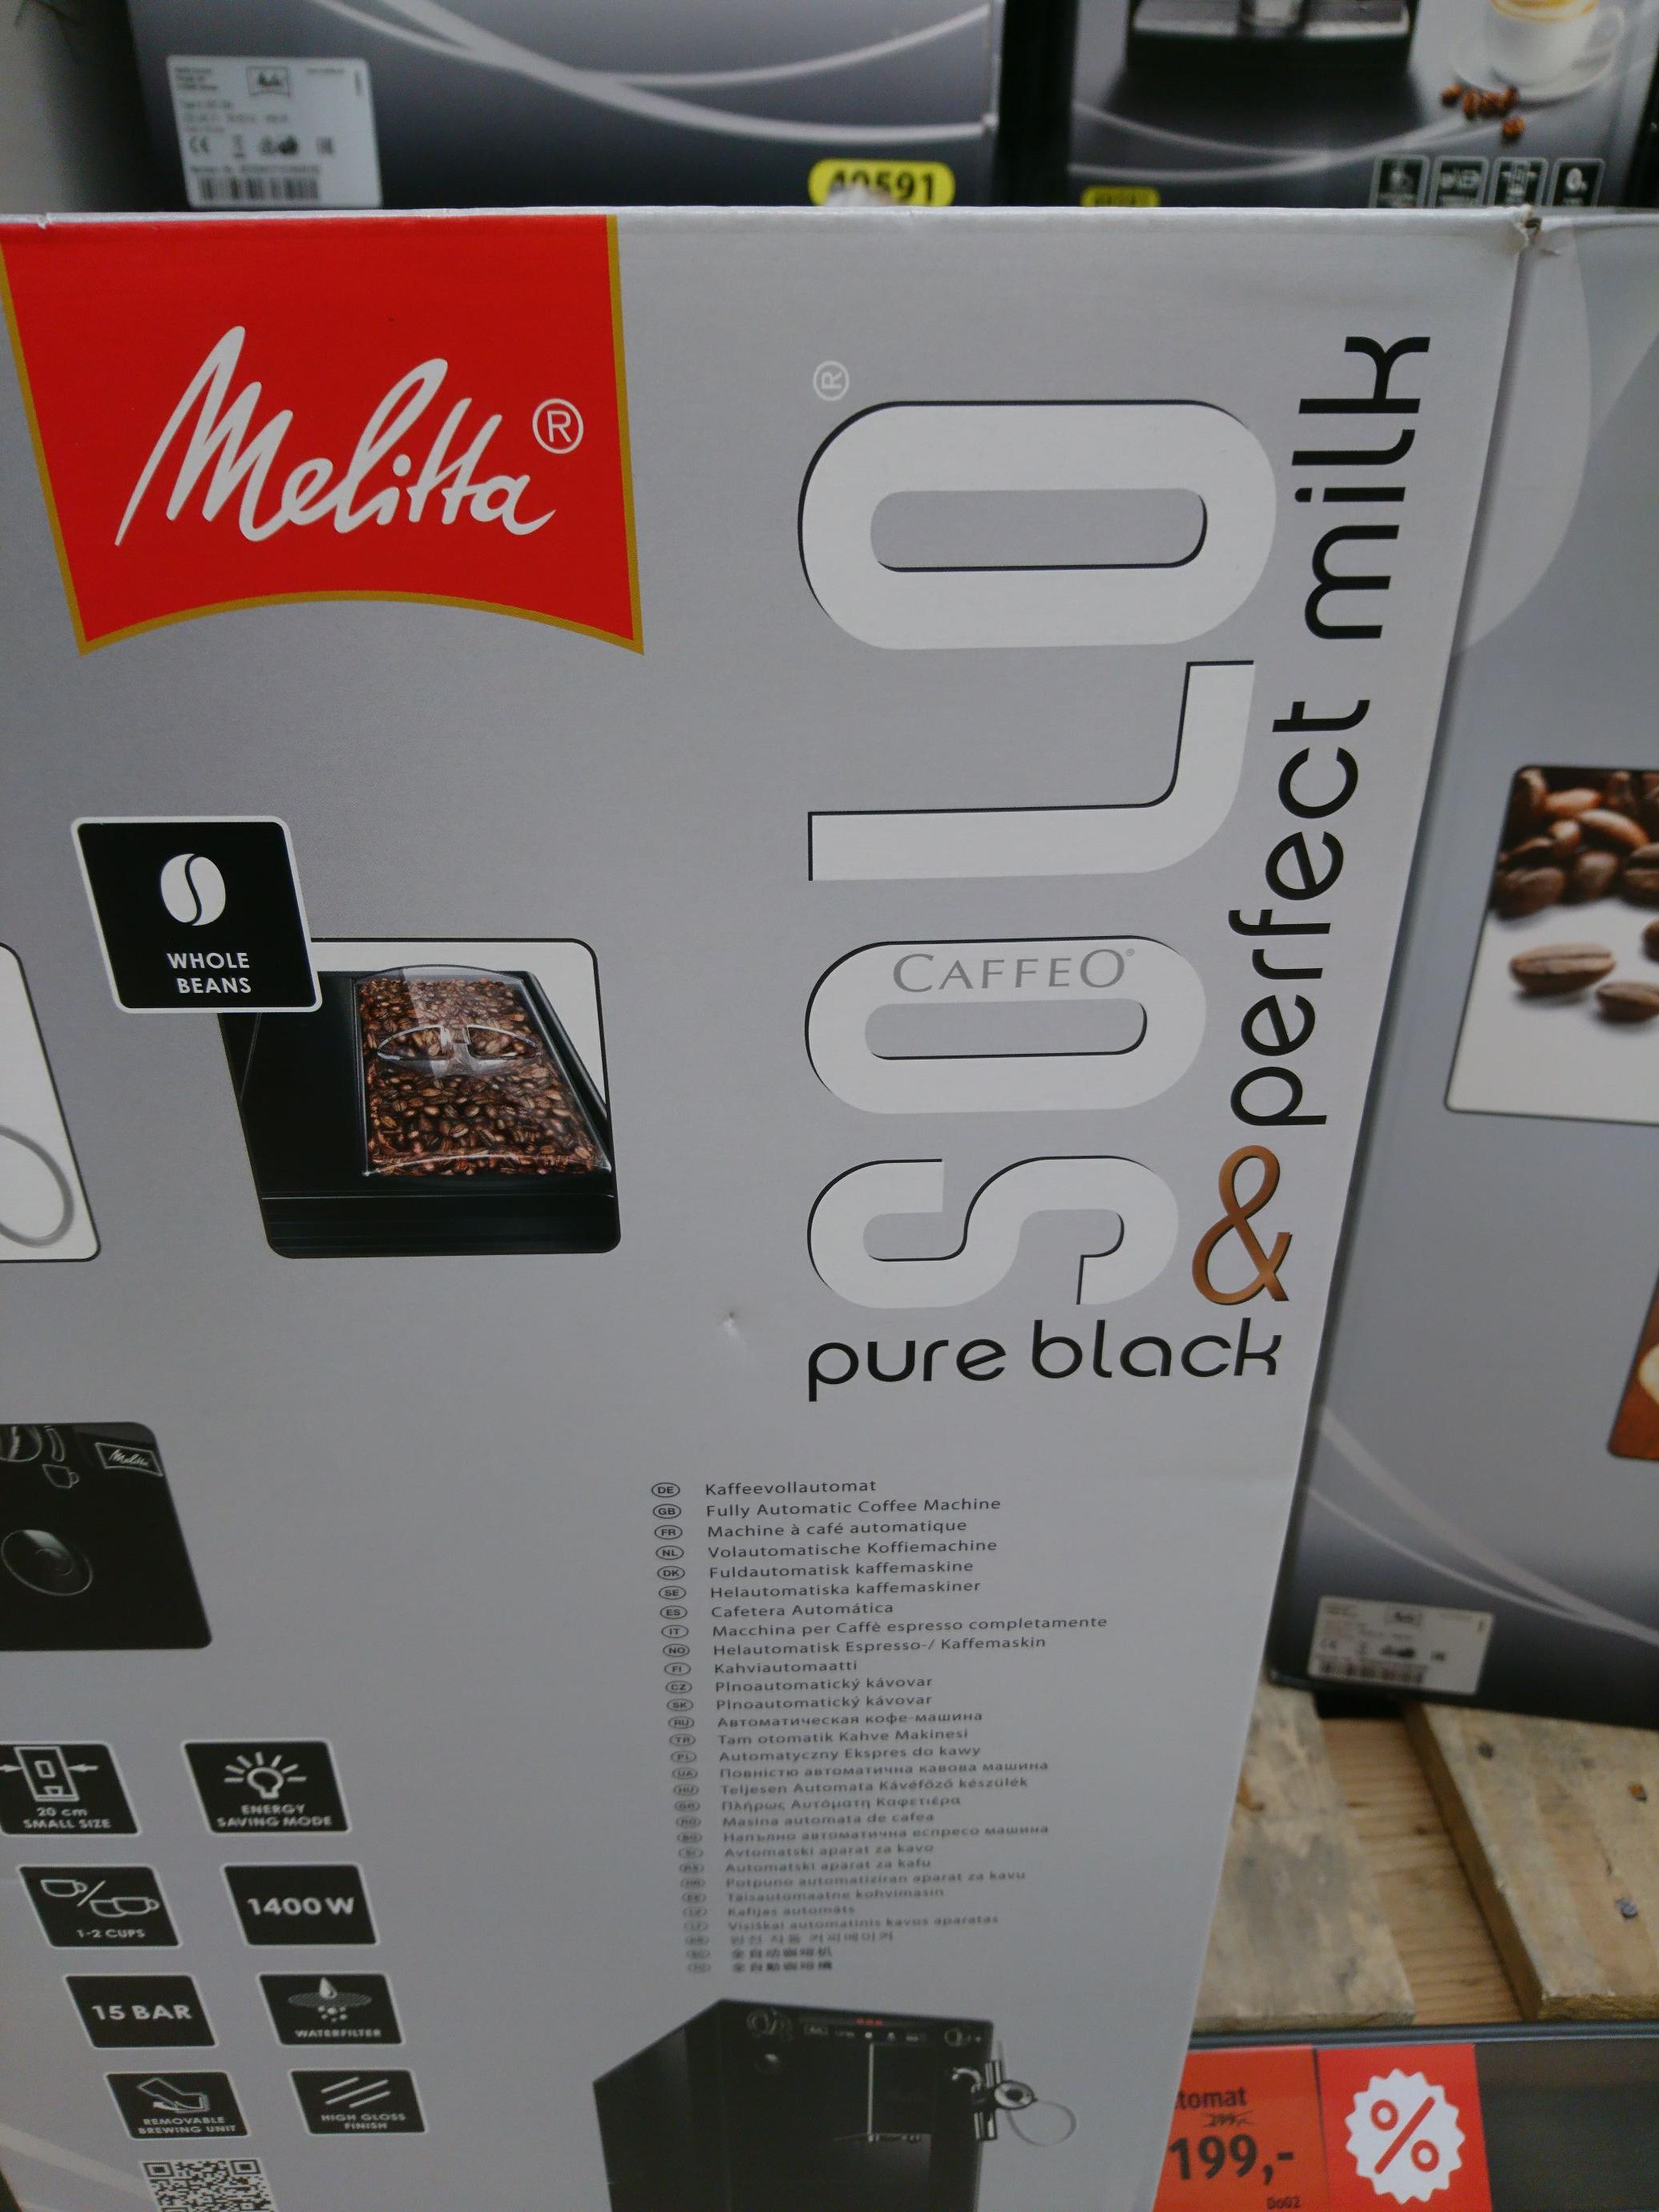 Lokal Duisburg Aldi: Melitta Kaffeevollautomat Caffeo Solo Perfect Milk